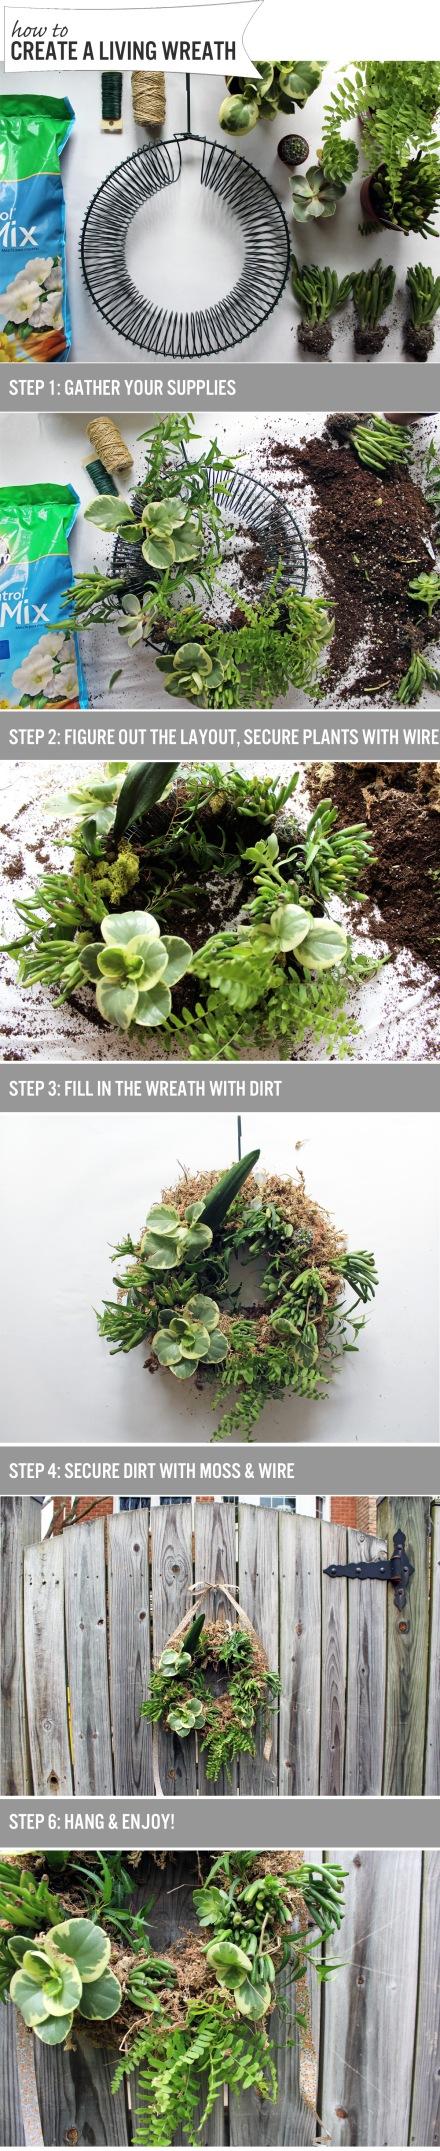 How to: Create a Living Wreath | www.theanatomyofdesign.com